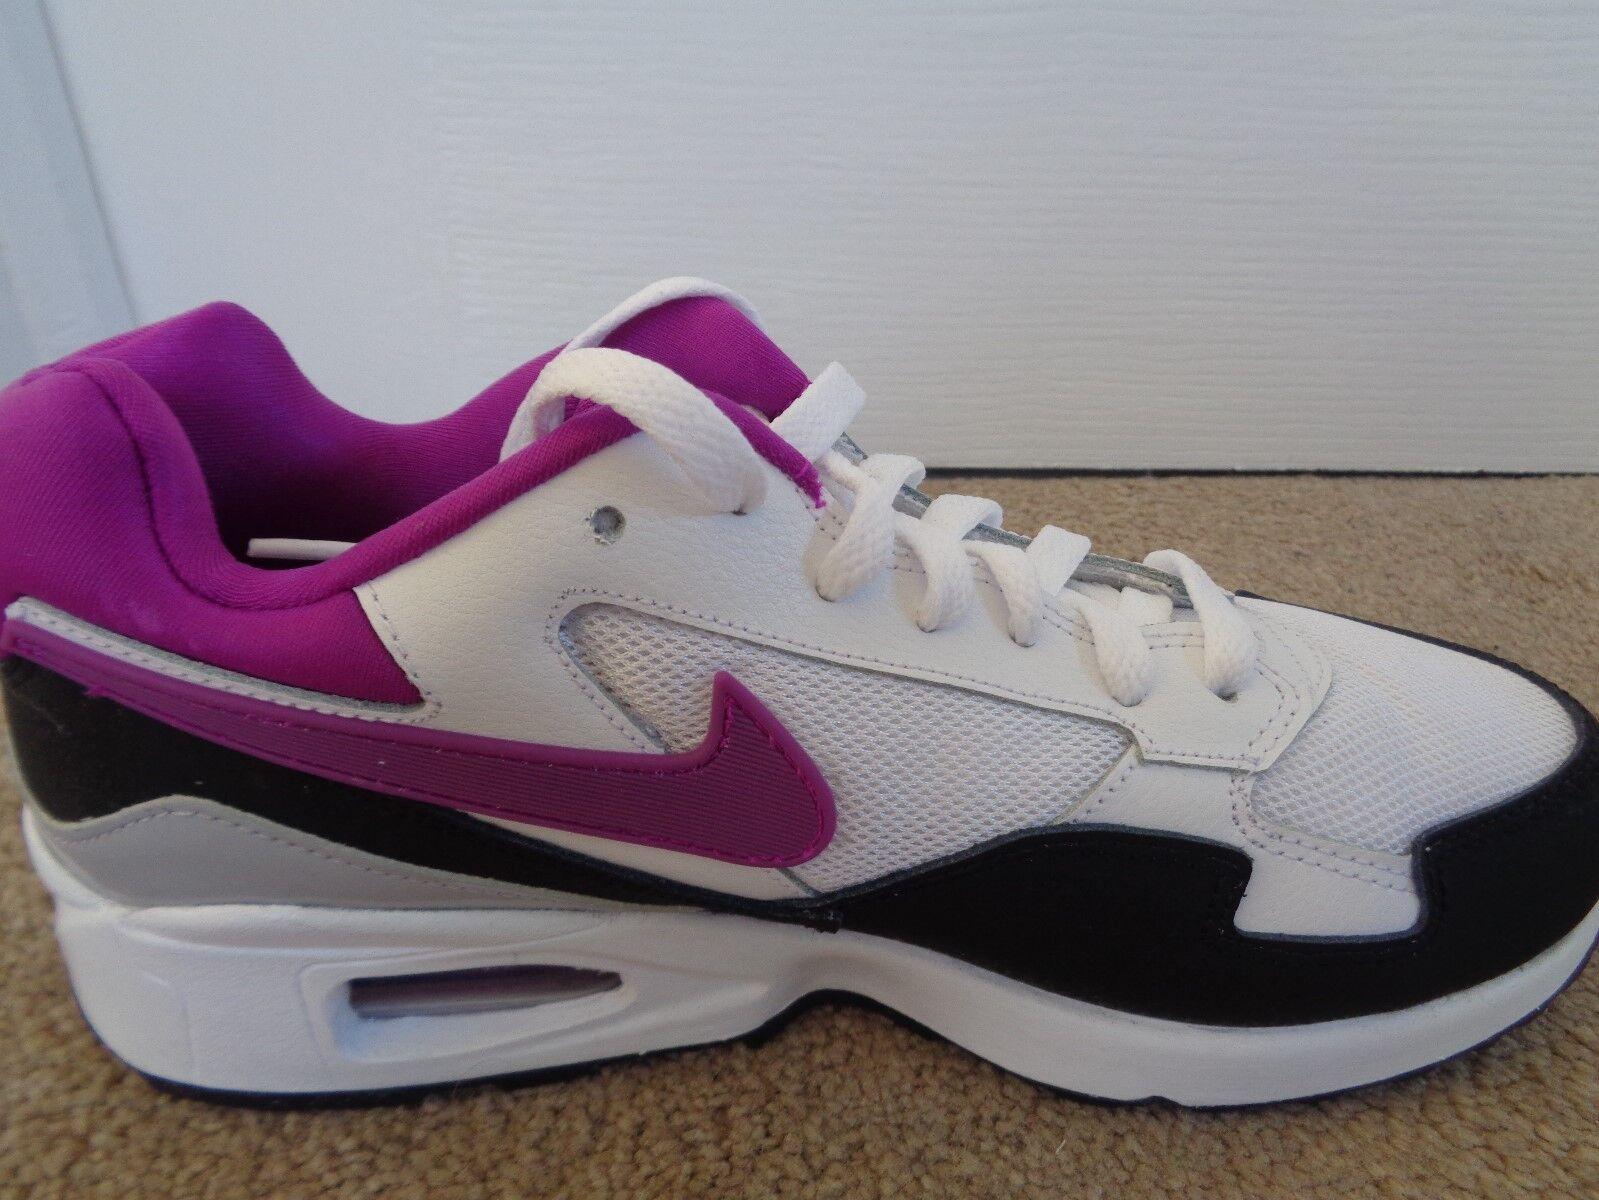 Nike trainers Air max ST womens trainers Nike shoes 705003 104 uk 4.5 eu 38 us 6 NEW+BOX 6f286d